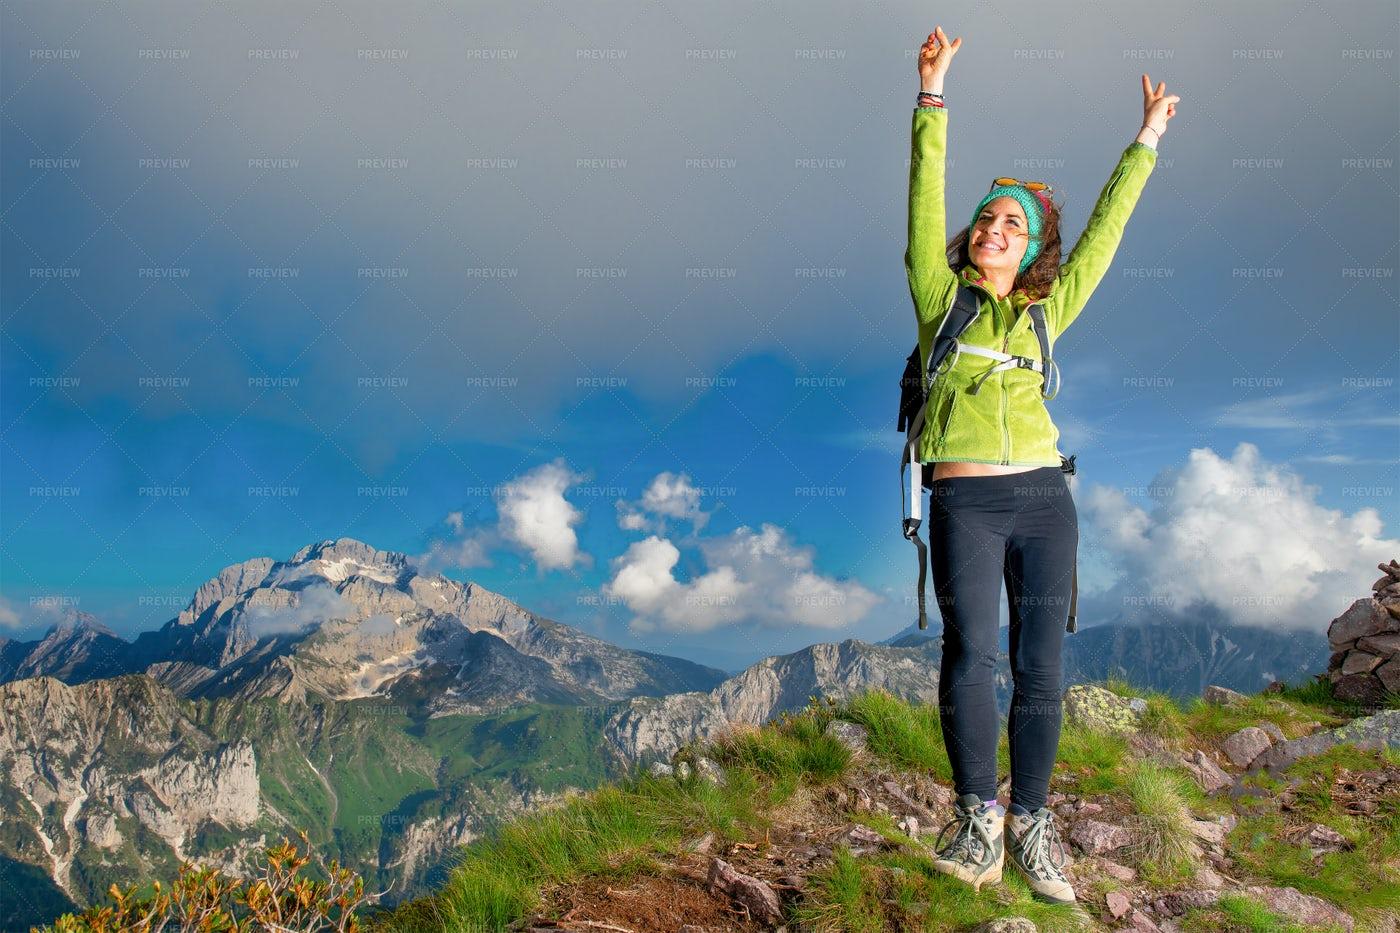 Woman In Top Of Mountain: Stock Photos